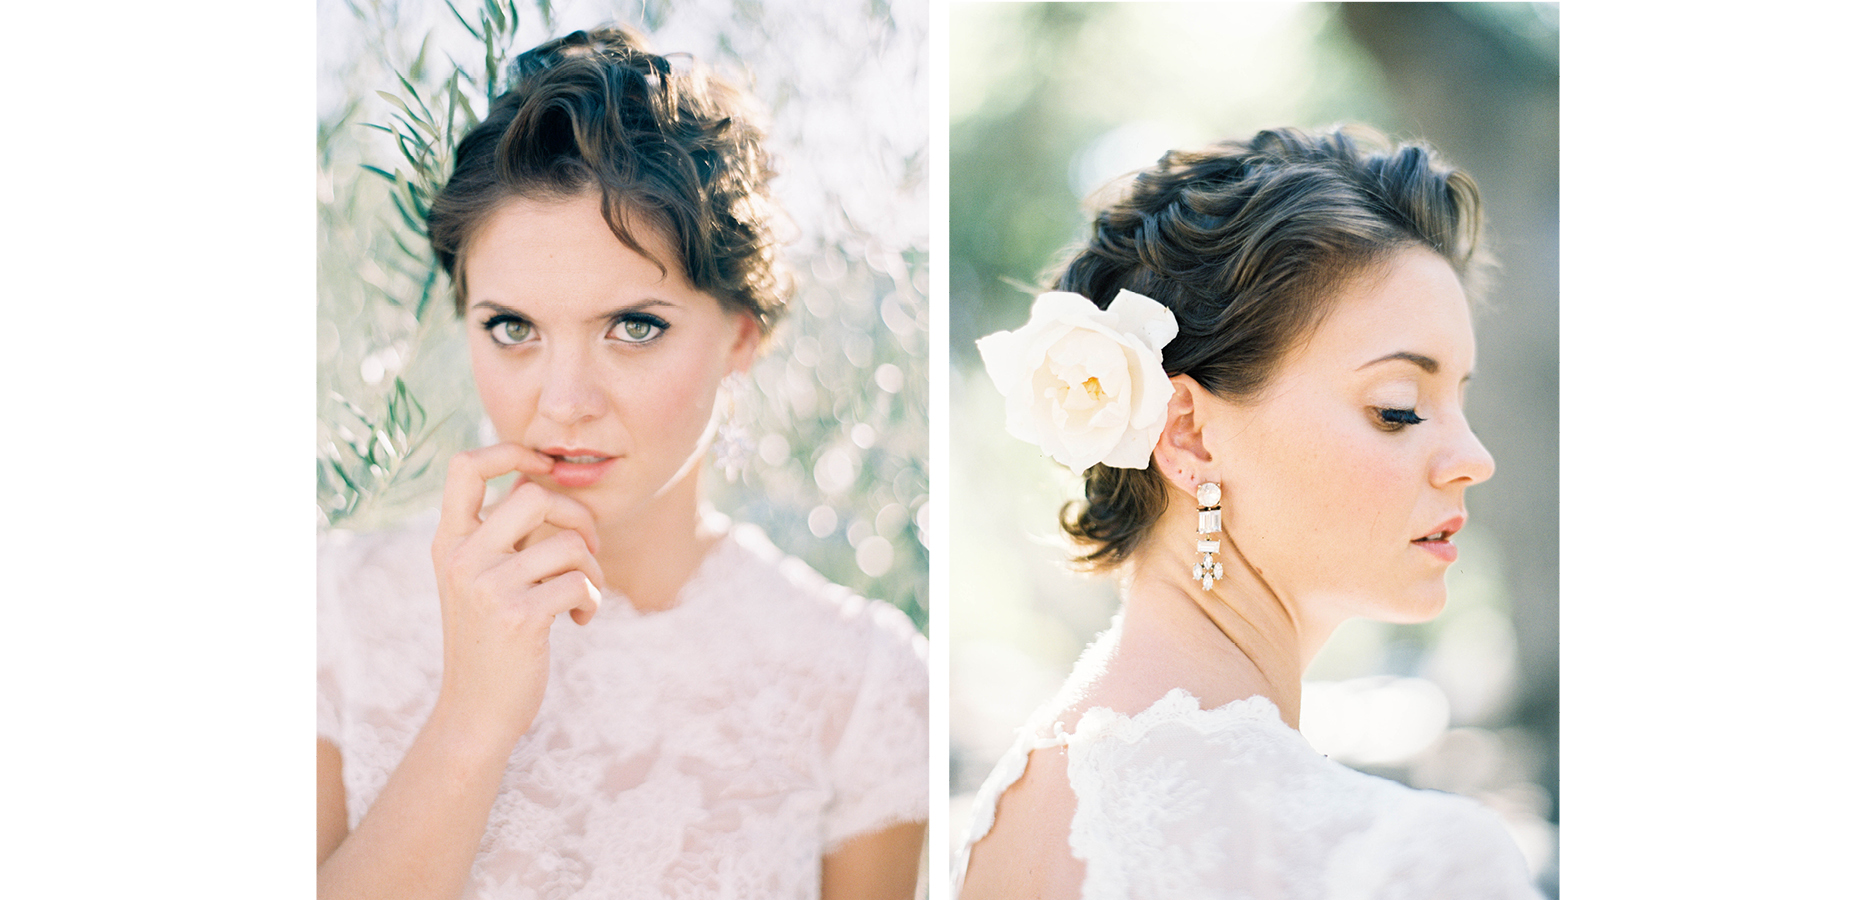 Jess-Wilcox-Hair-Makeup-Wedding_portfolio6.jpg